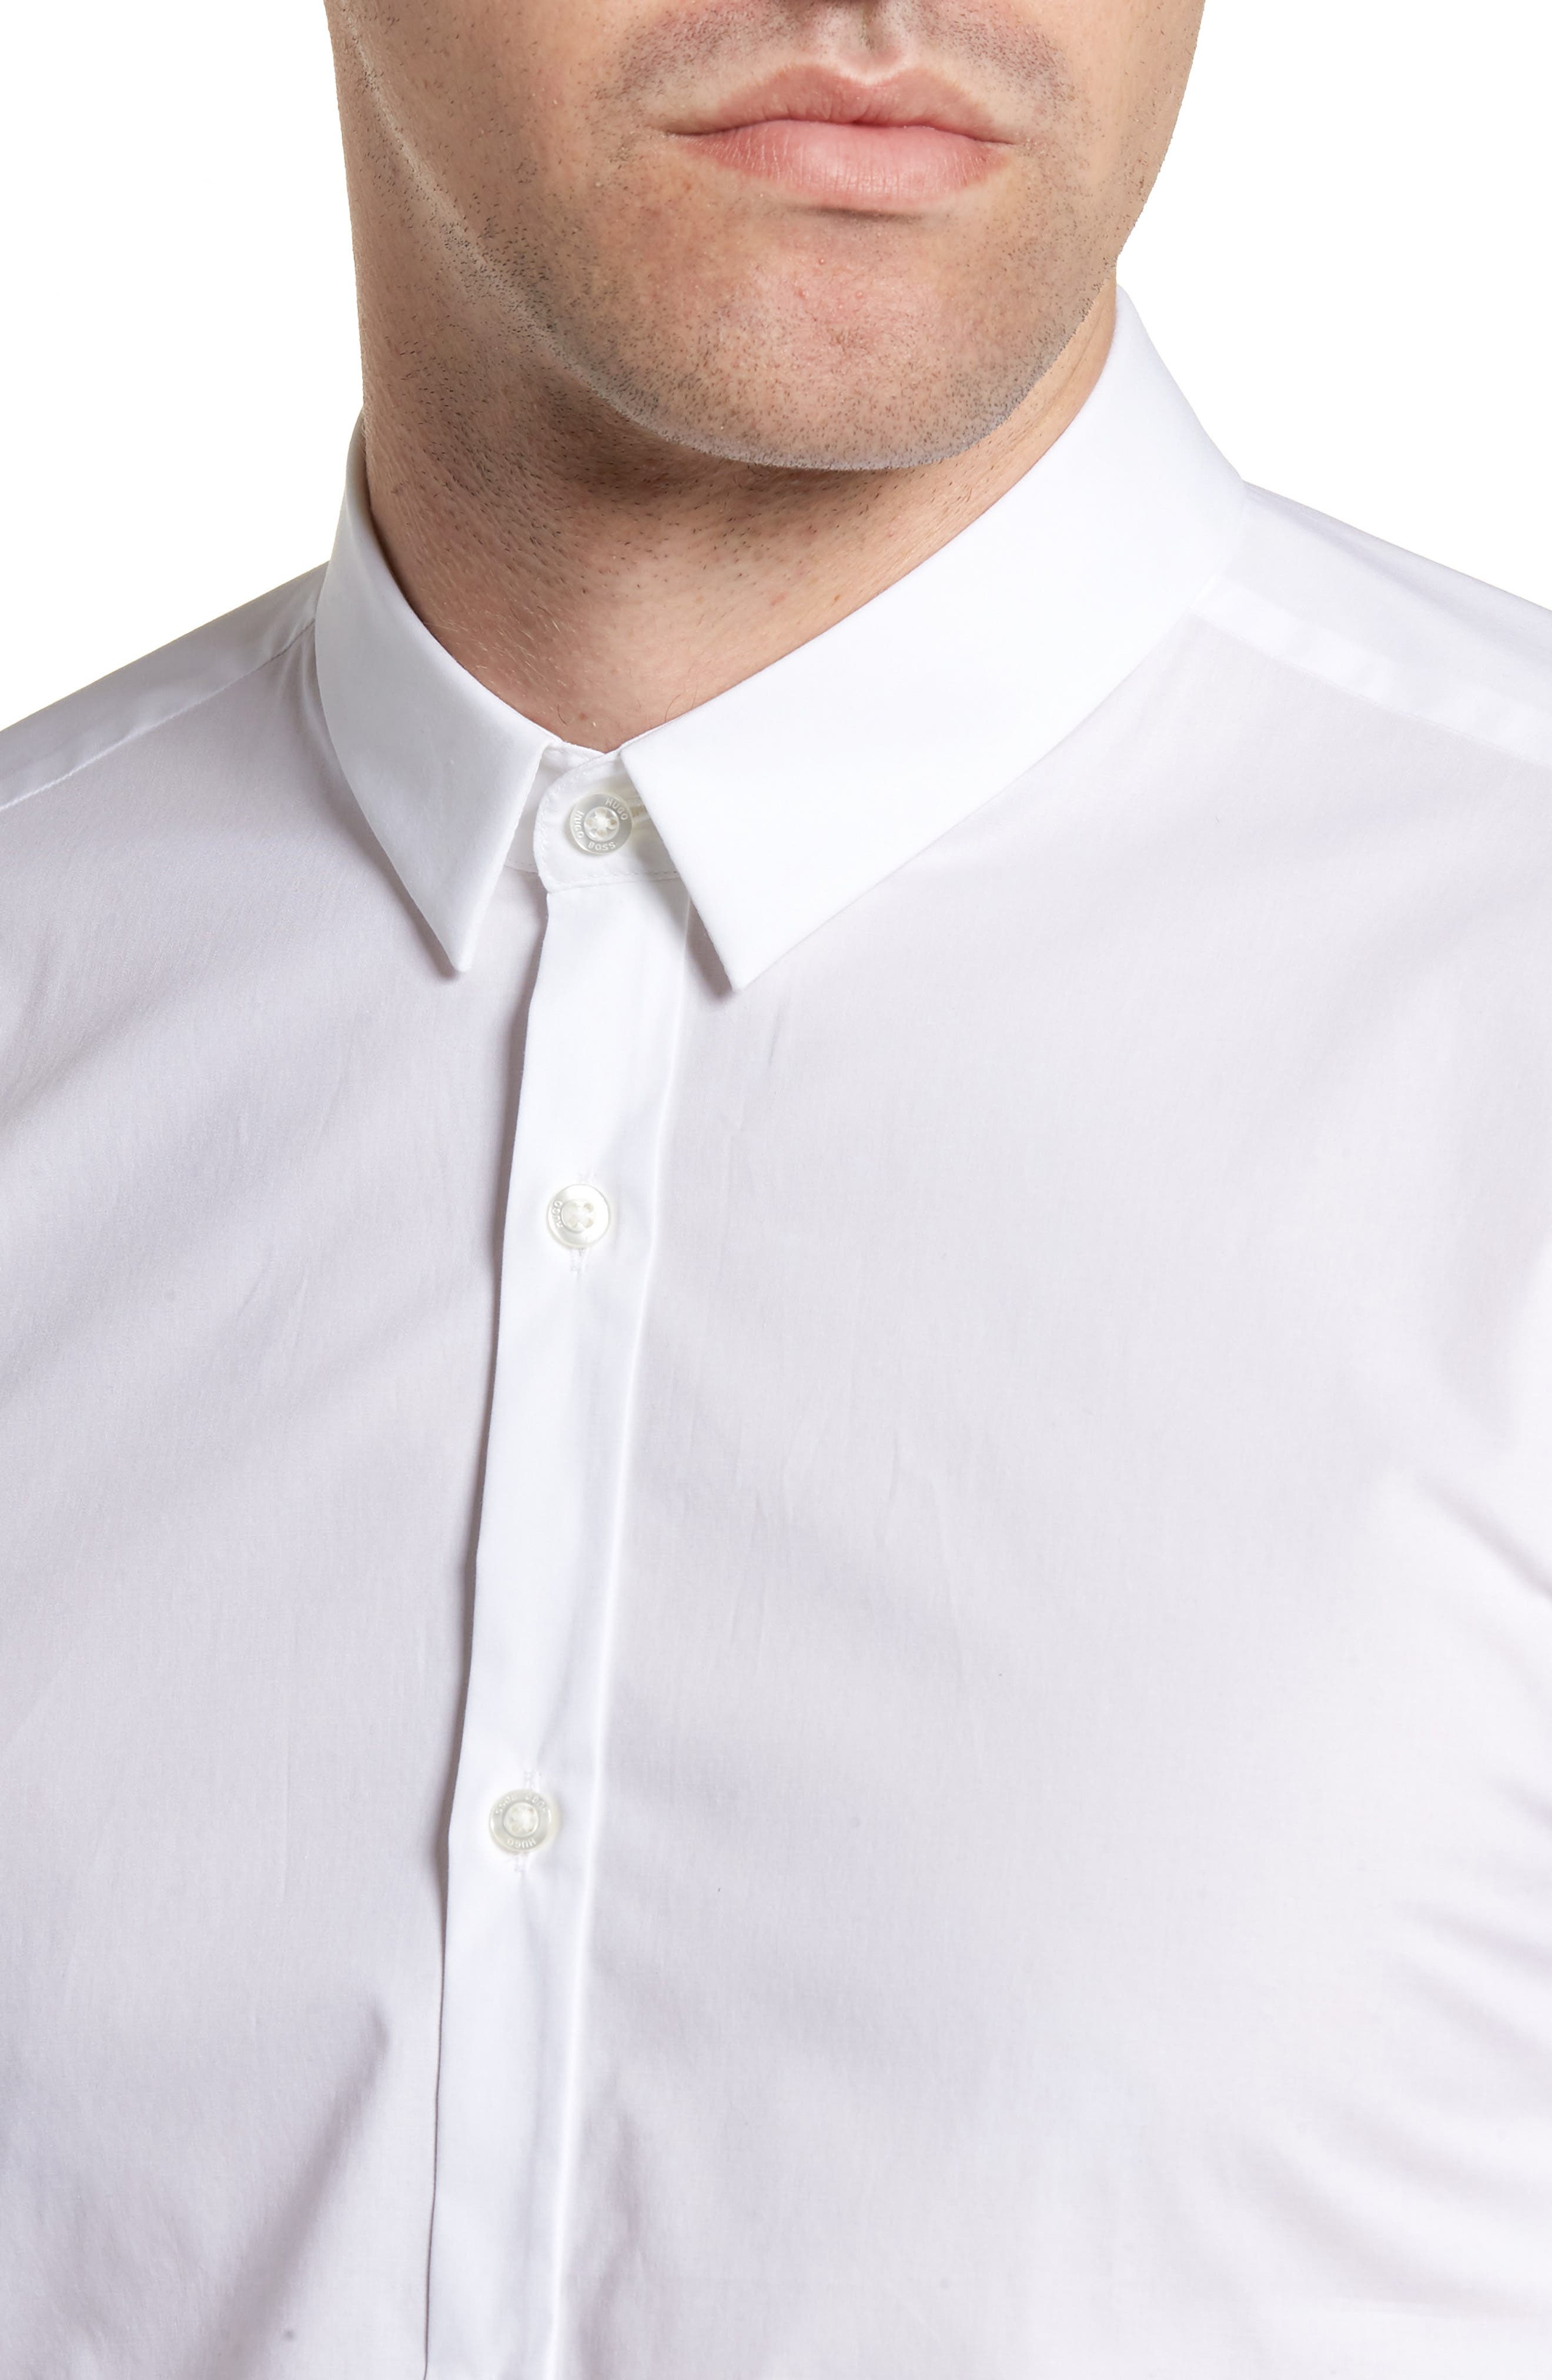 Ero3 Trim Fit Sport Shirt,                             Alternate thumbnail 4, color,                             White